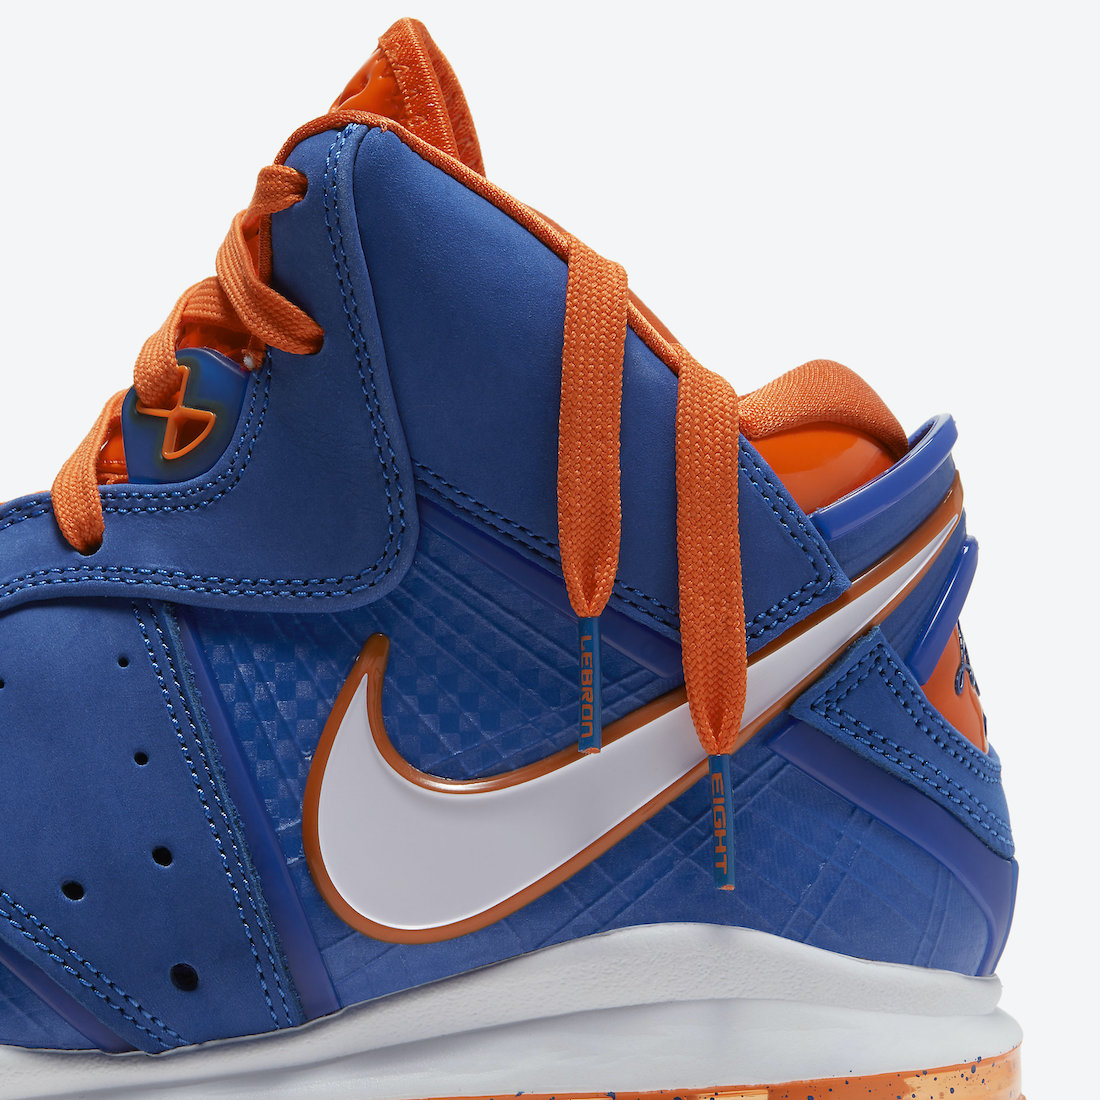 Nike-LeBron-8-HWC-Hardwood-Classic-CV1750-400-2021-Release-Date-Price-9